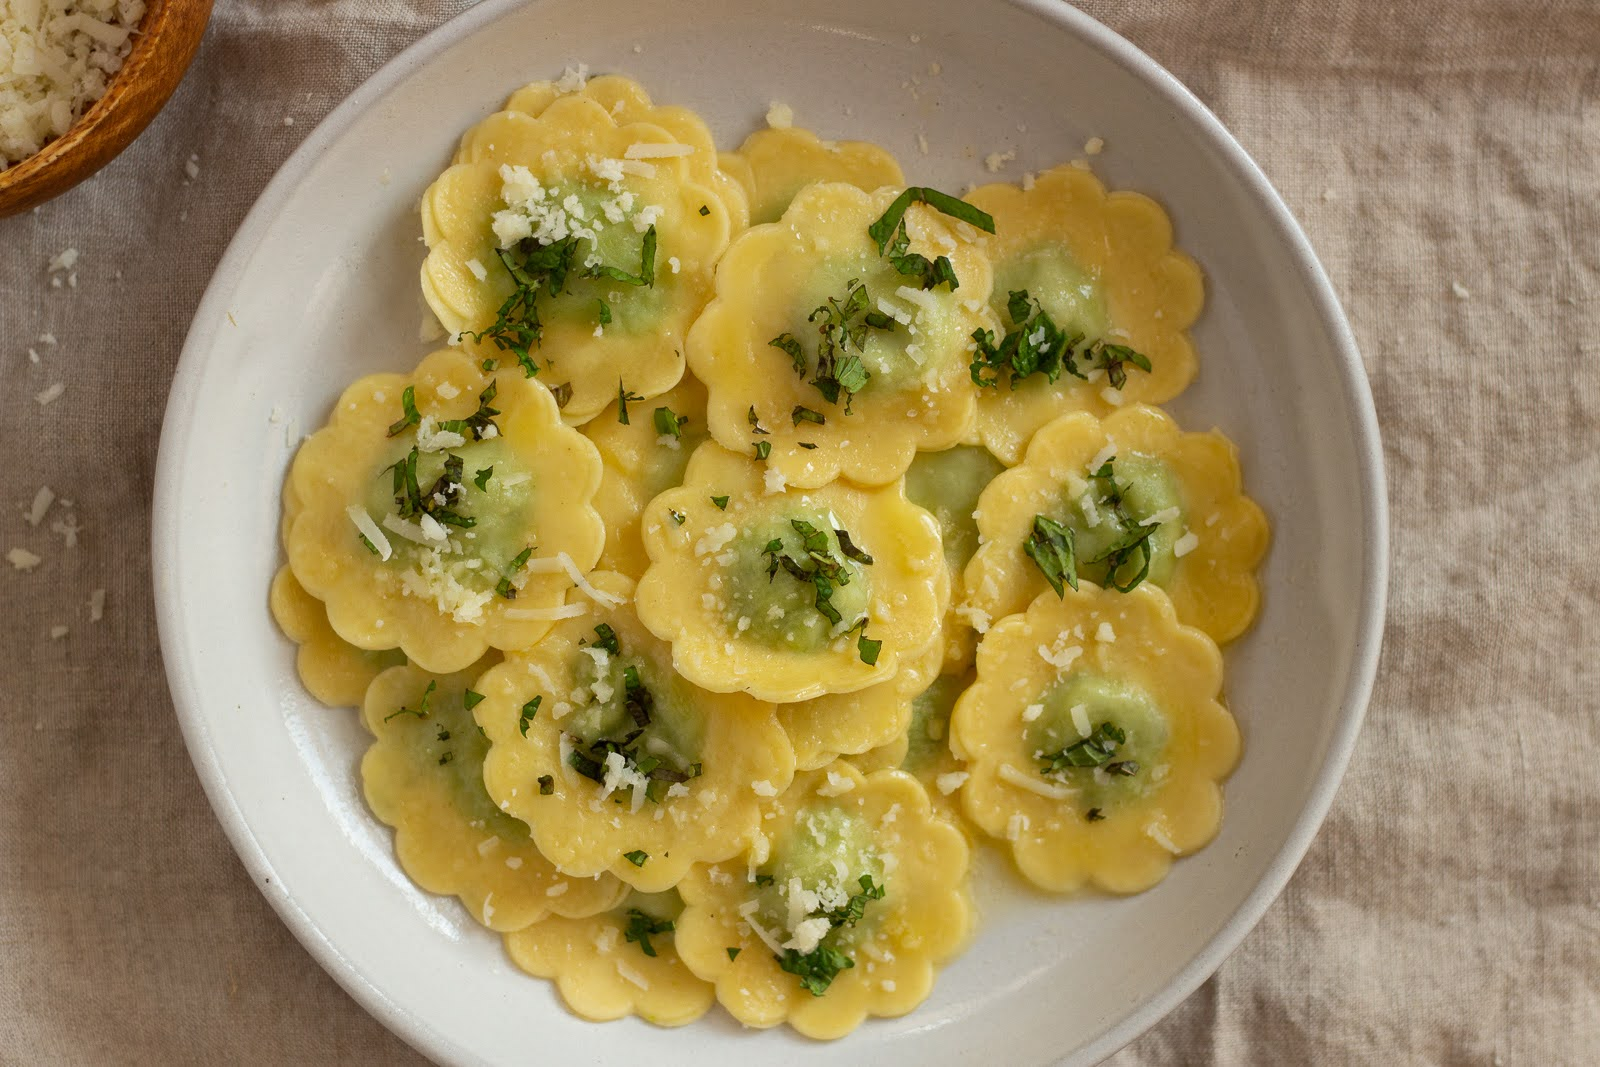 pea ravioli ai fiori flower ravioli - qb cucina